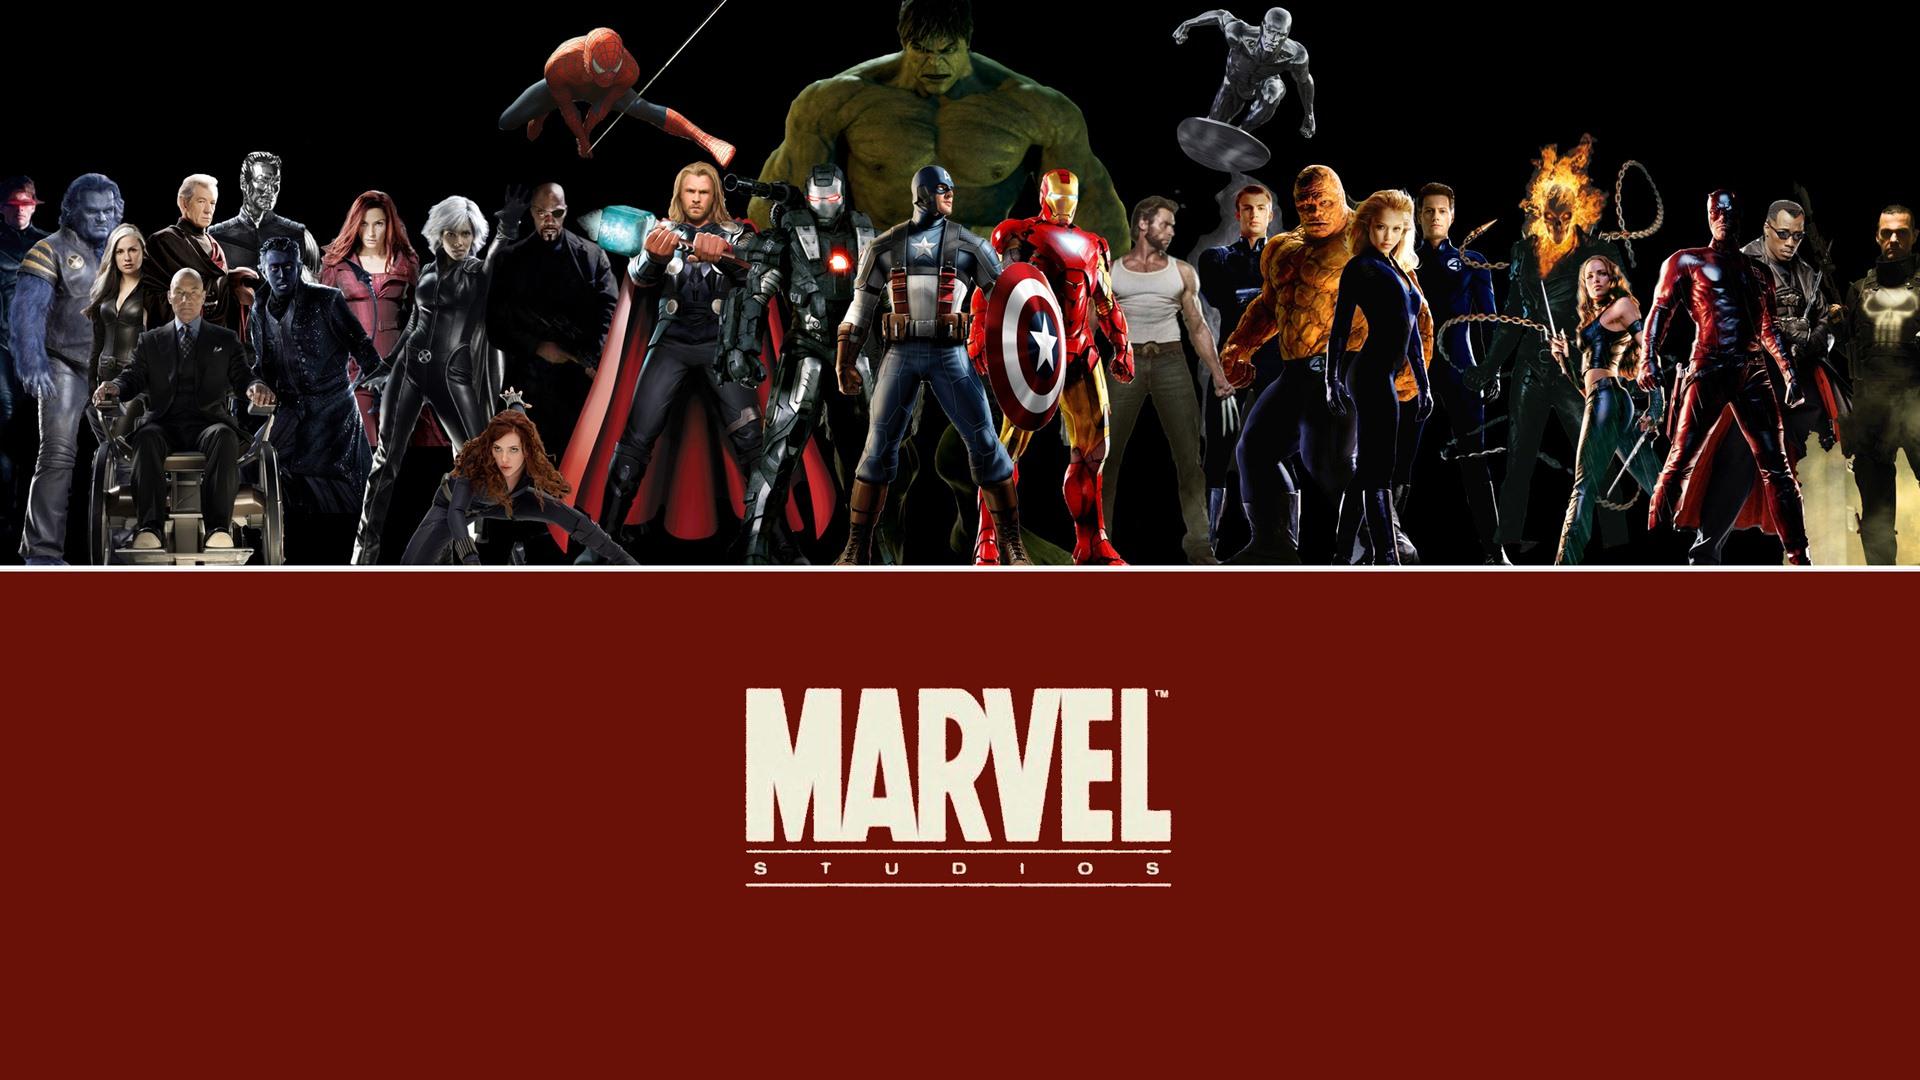 The Avengers 2012 Hd Wallpapers 8 1920x1080 Wallpaper